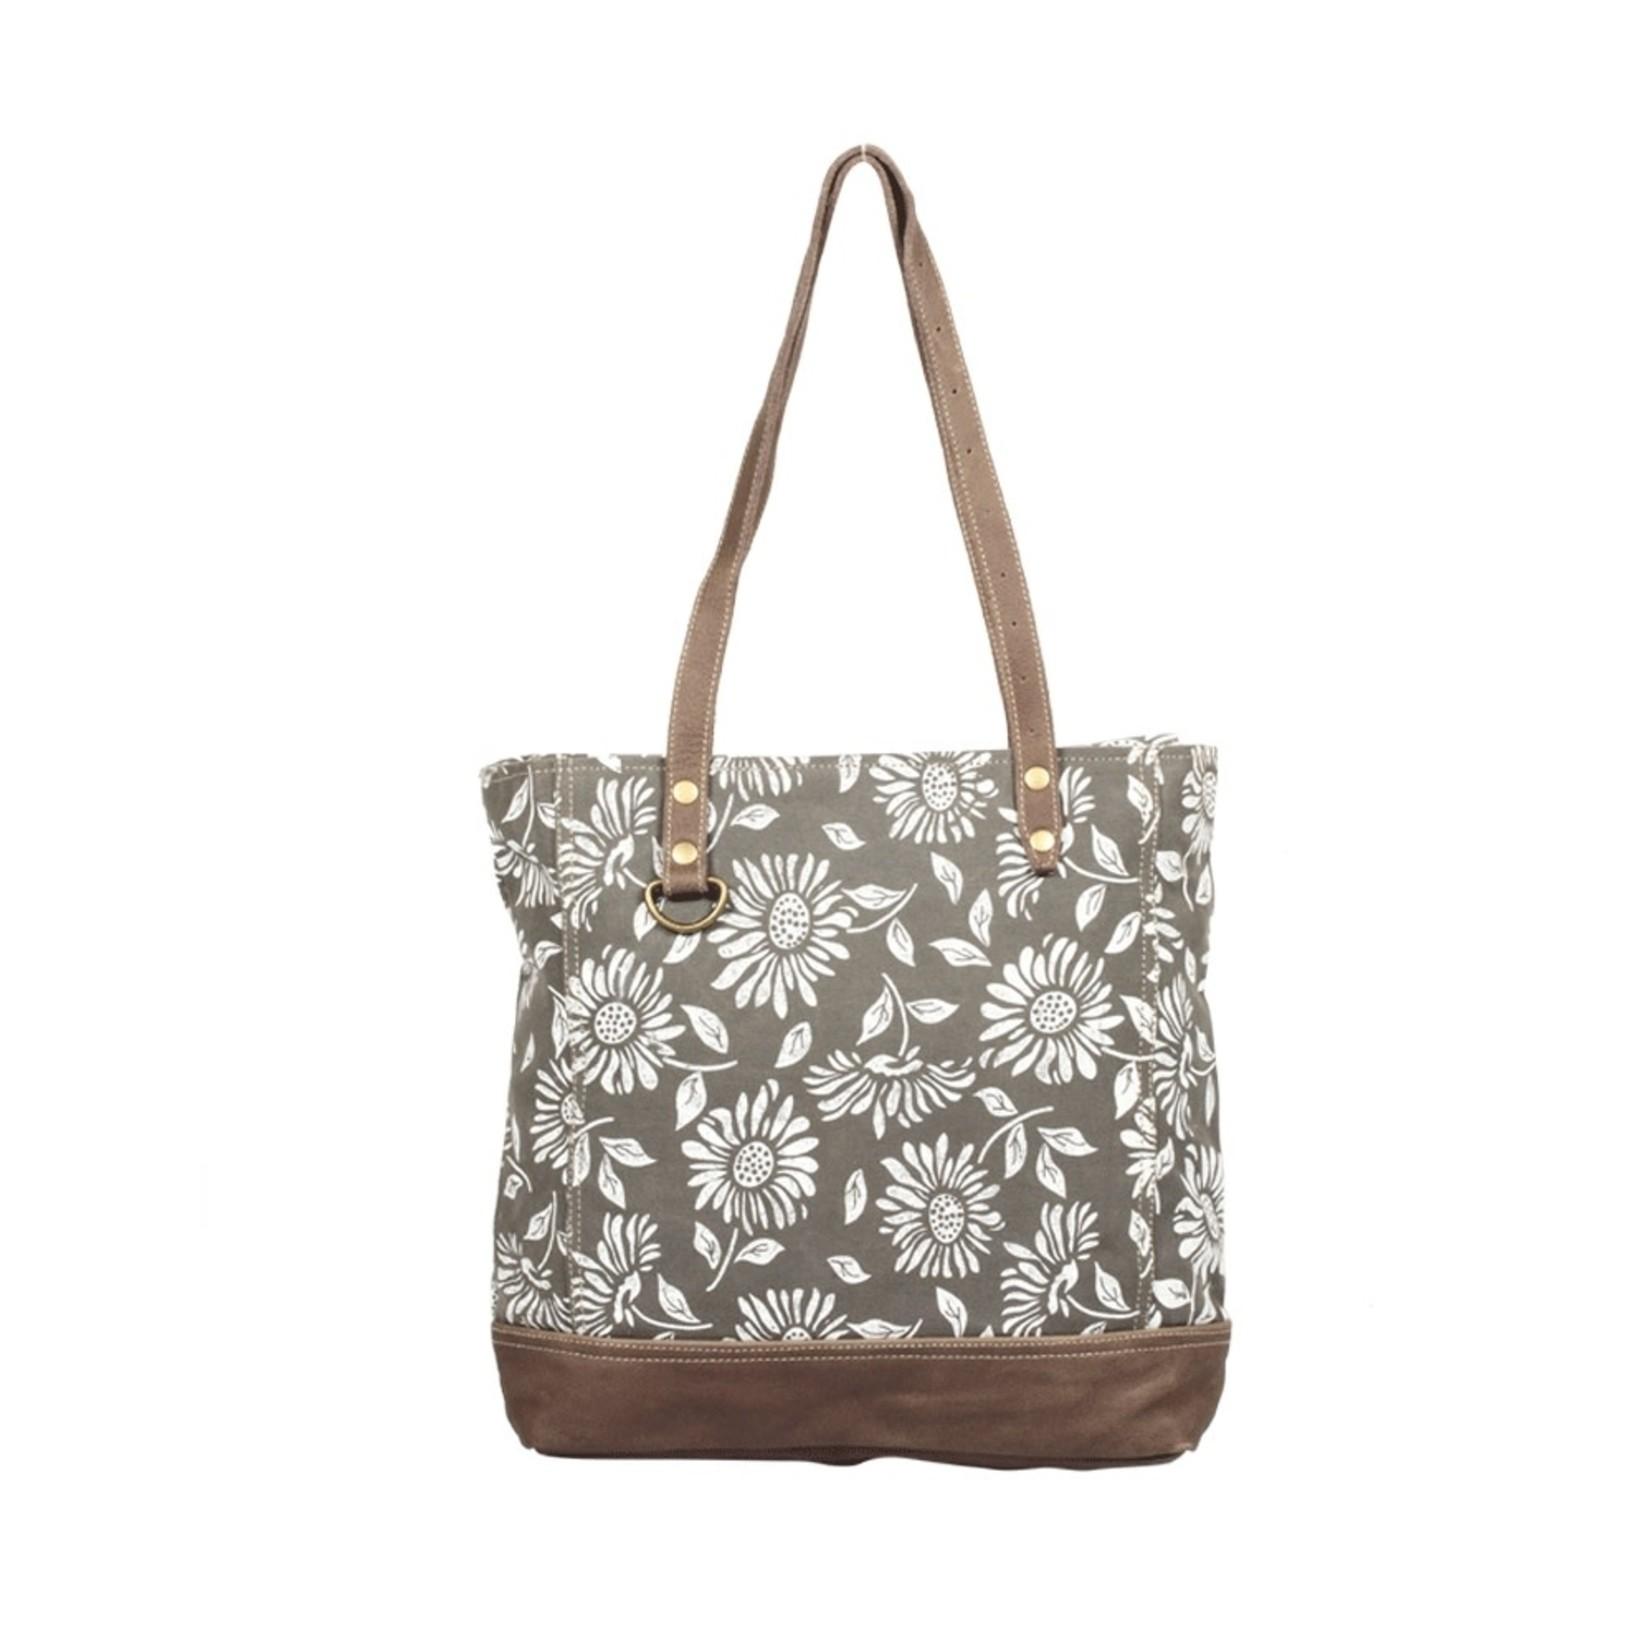 Myra Bags S-1284 Great Nautical Tote Bag